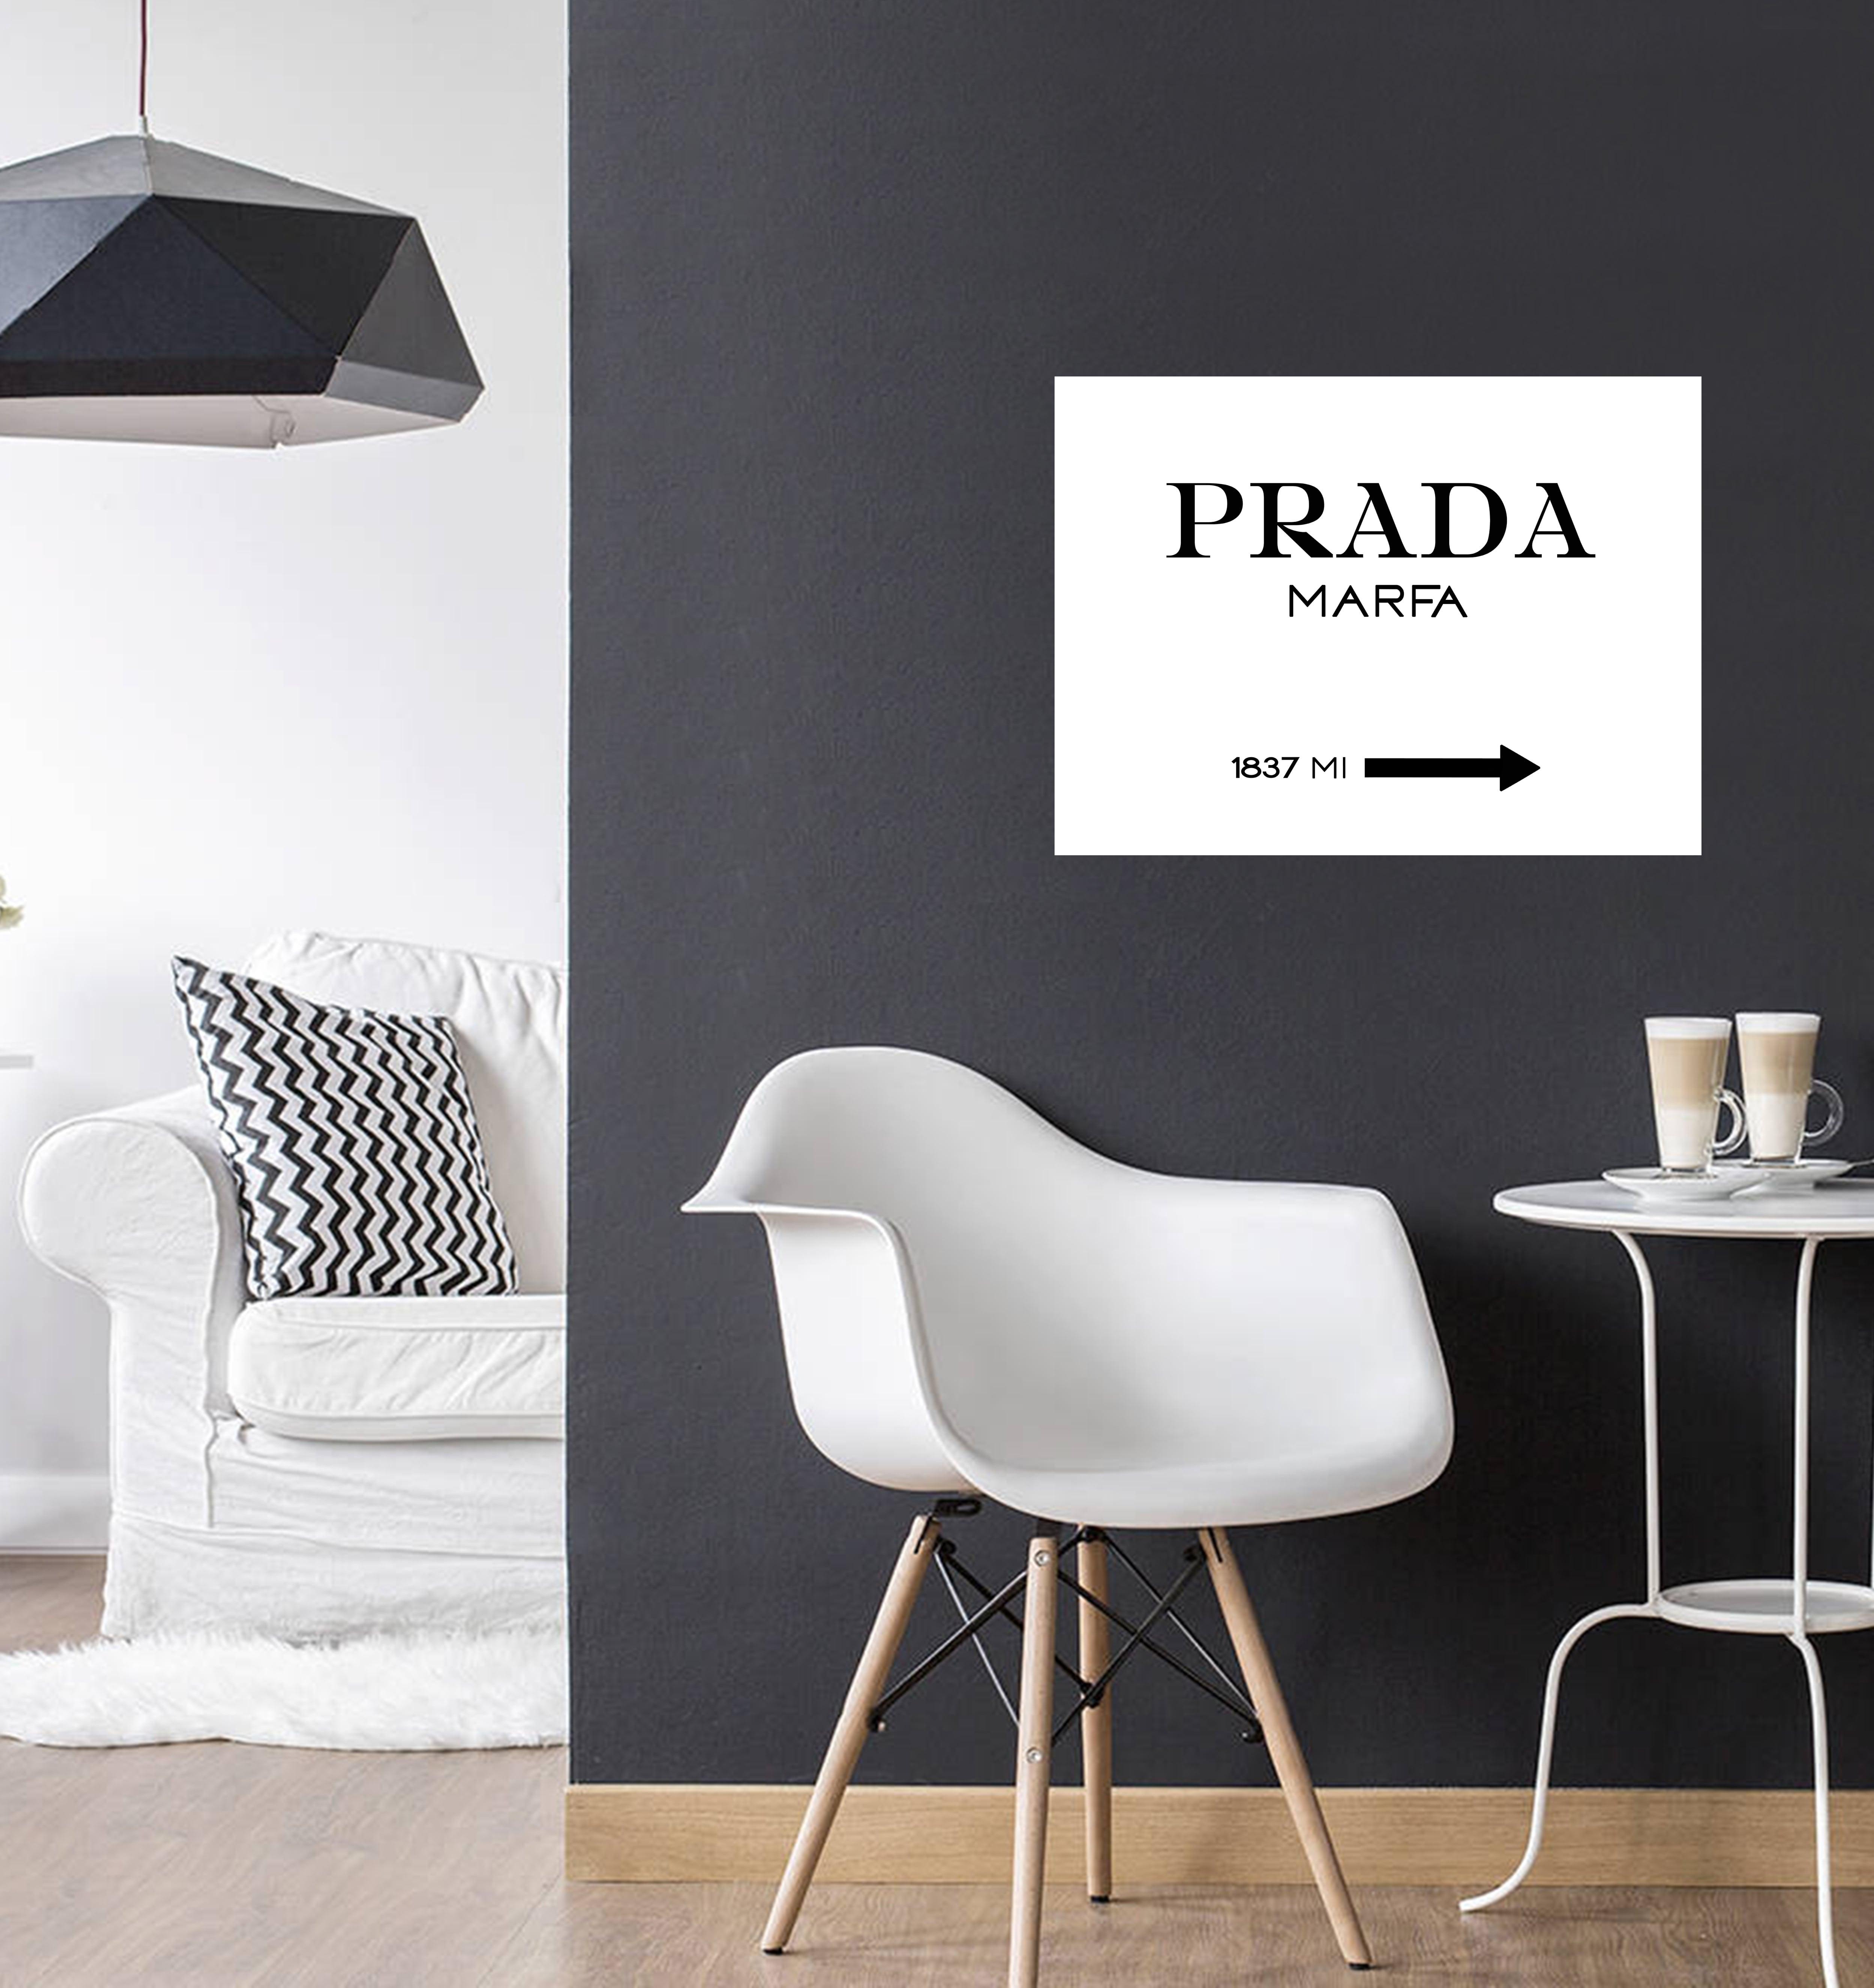 Tableau aluminium design prada marfa pour décoration murale